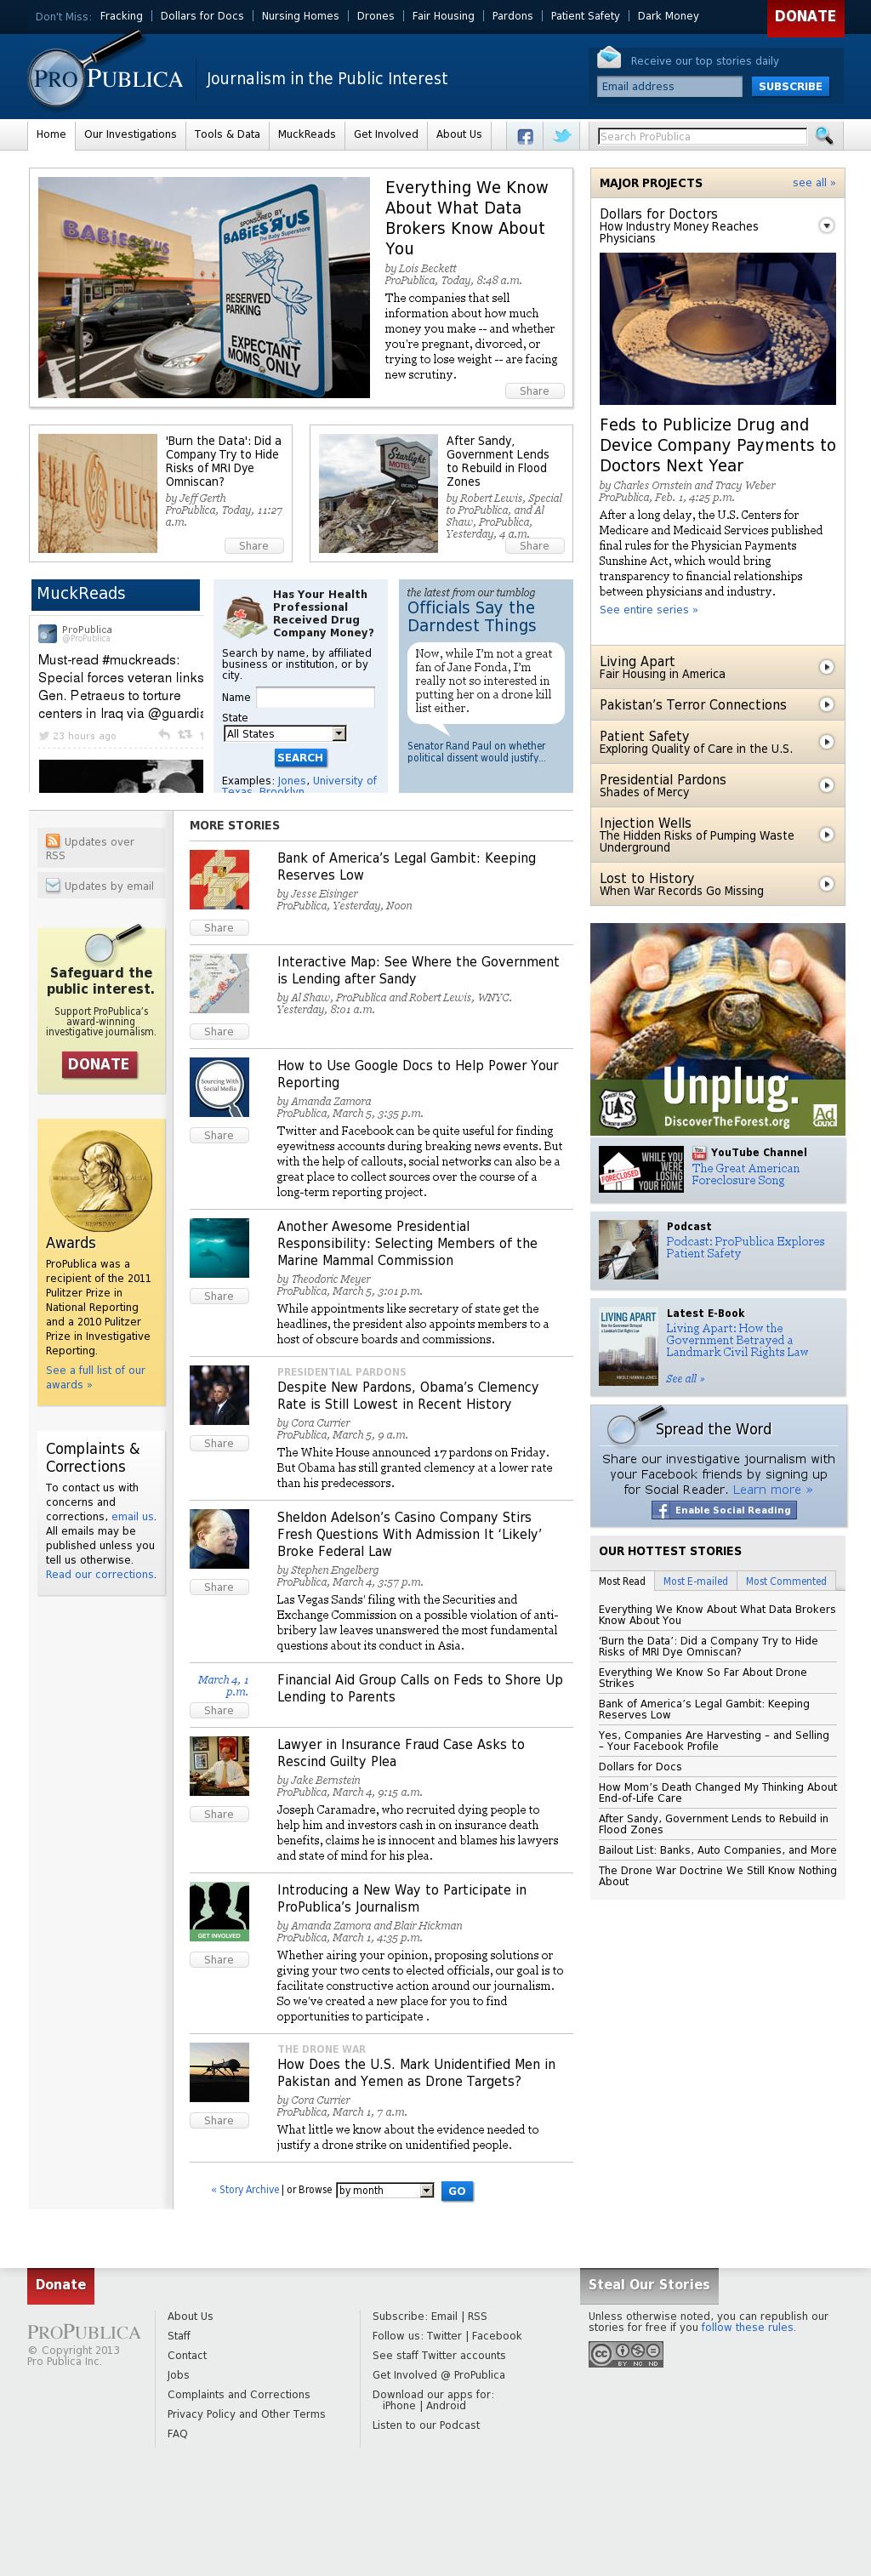 ProPublica at Friday March 8, 2013, 2:17 a.m. UTC